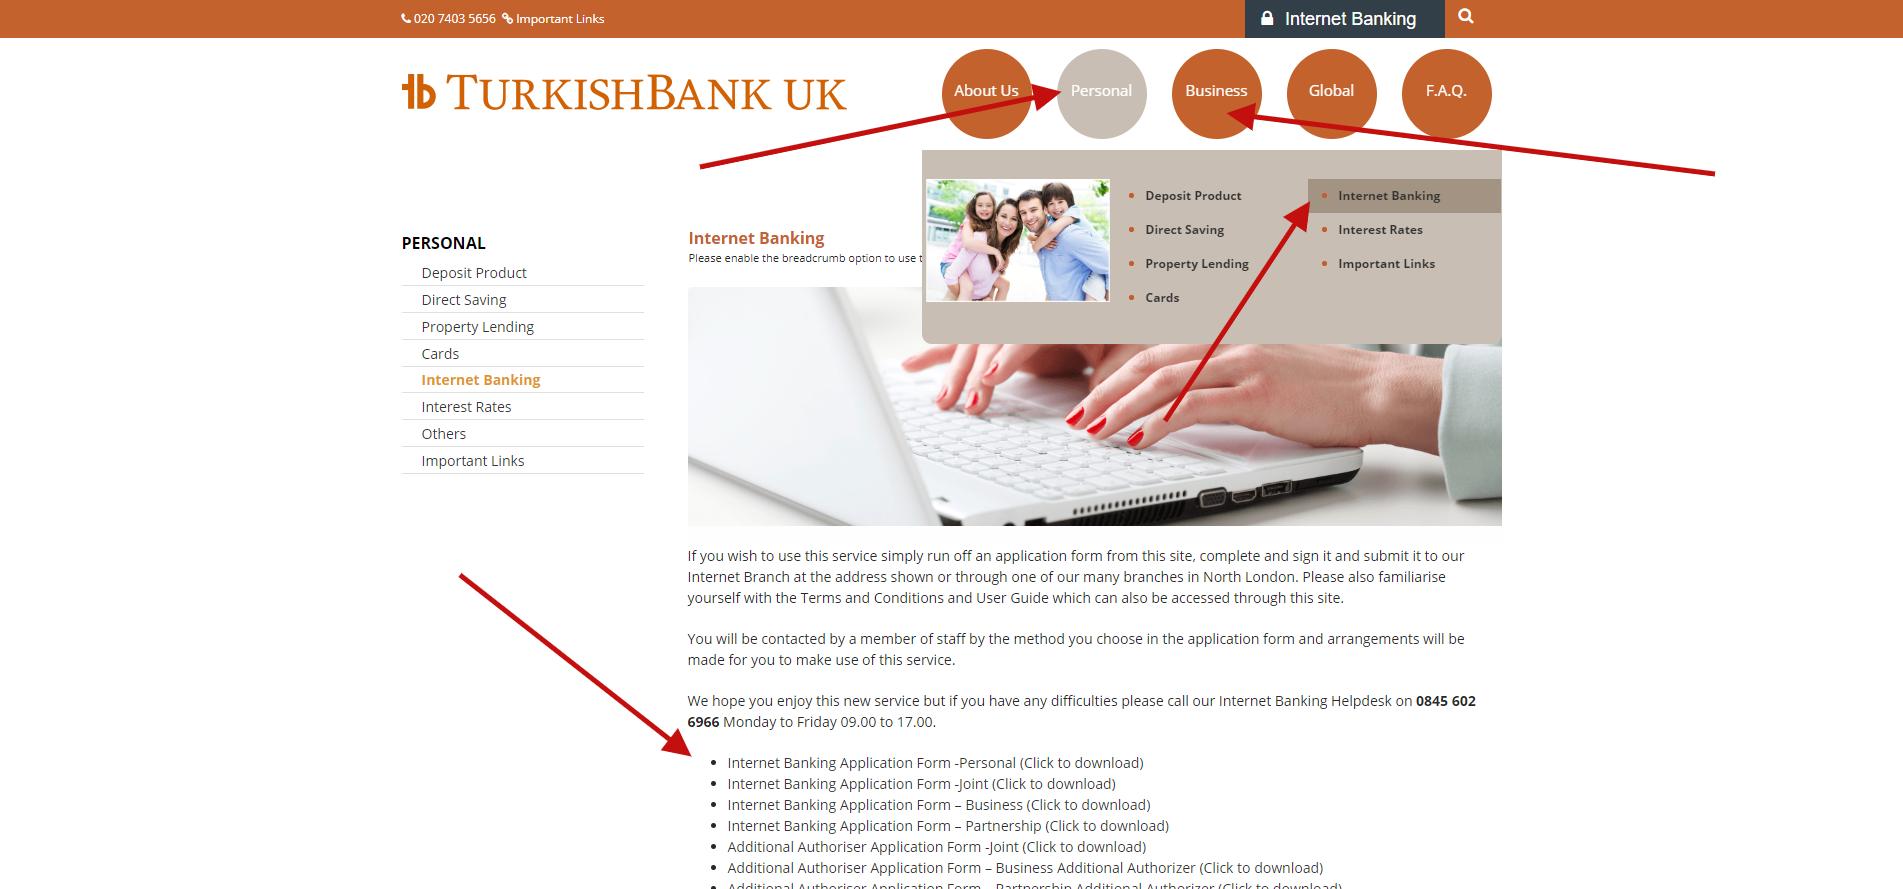 Turkish Bank UK, London, United Kingdom